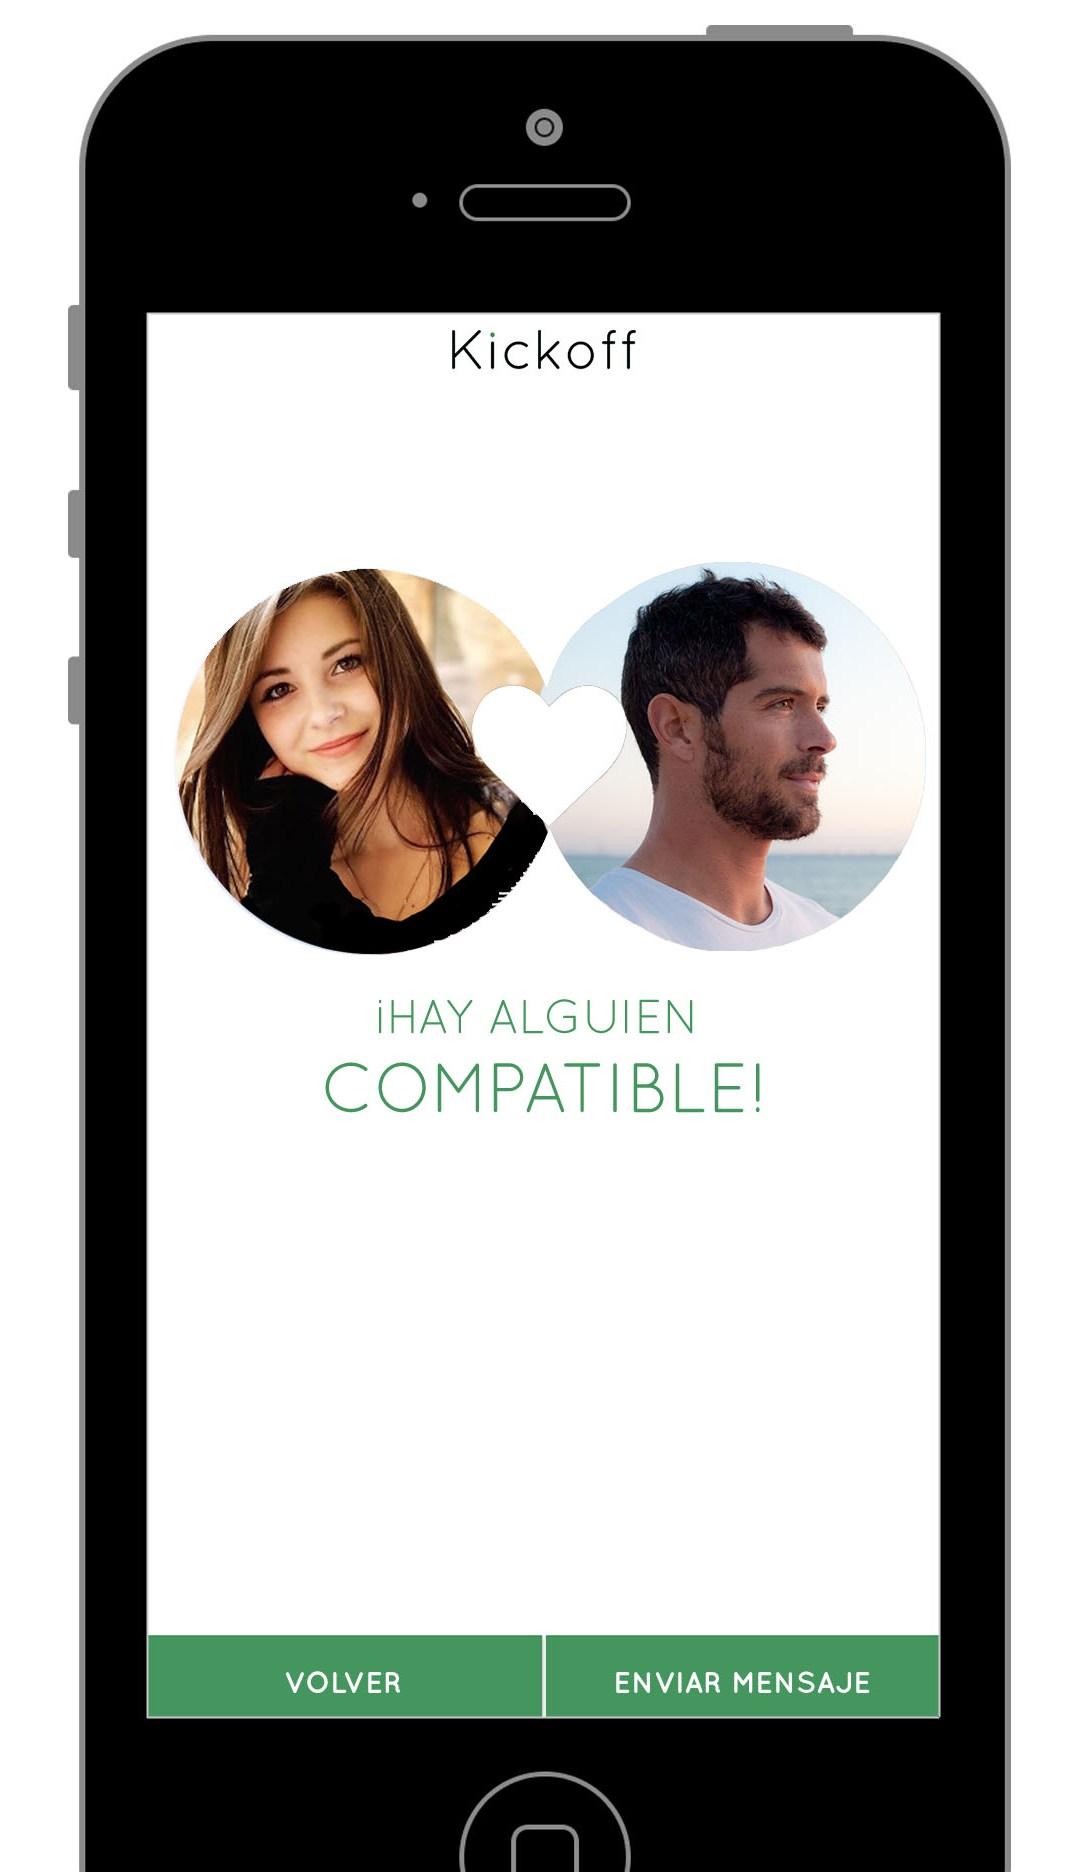 App Citas Gente 2018 Procura Sexo Gondomar-88989